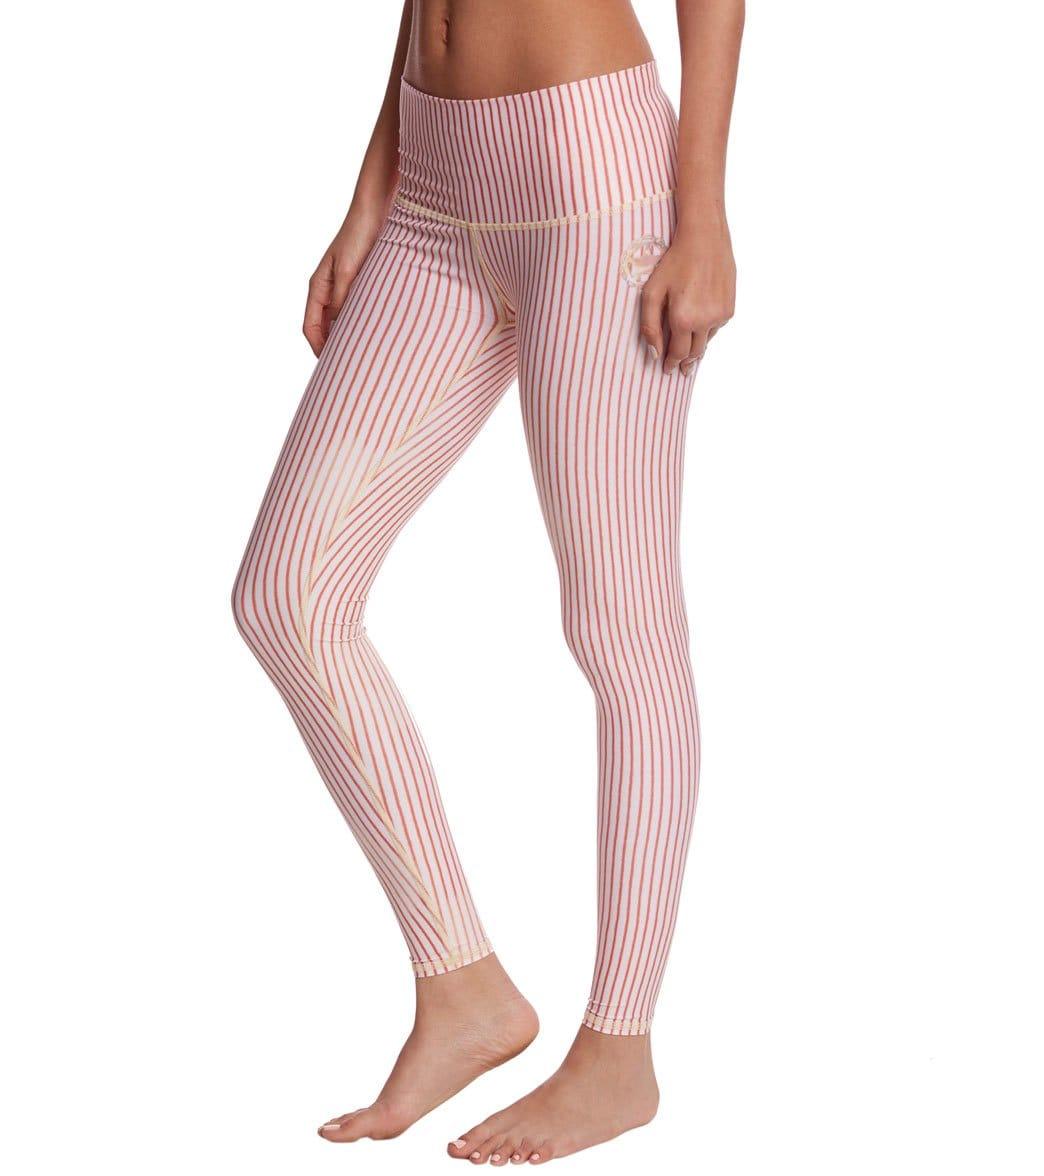 c35158f9ff1746 Teeki Candy Cane Hot Yoga Pants at YogaOutlet.com - Free Shipping